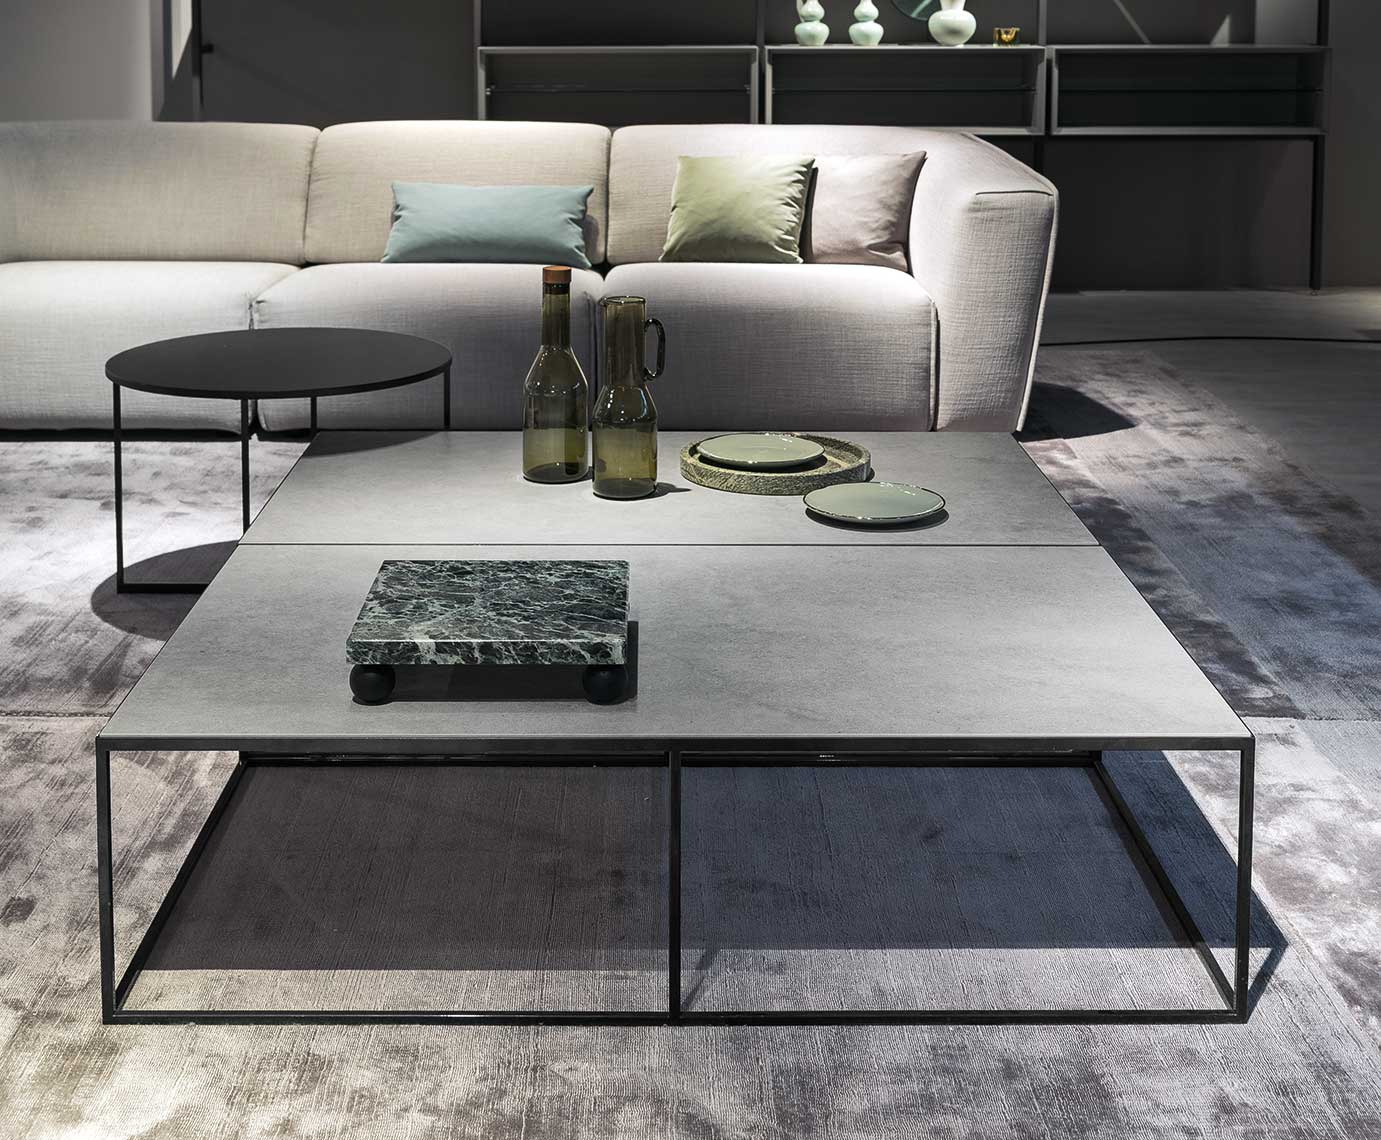 kobe coffe table 01.jpg